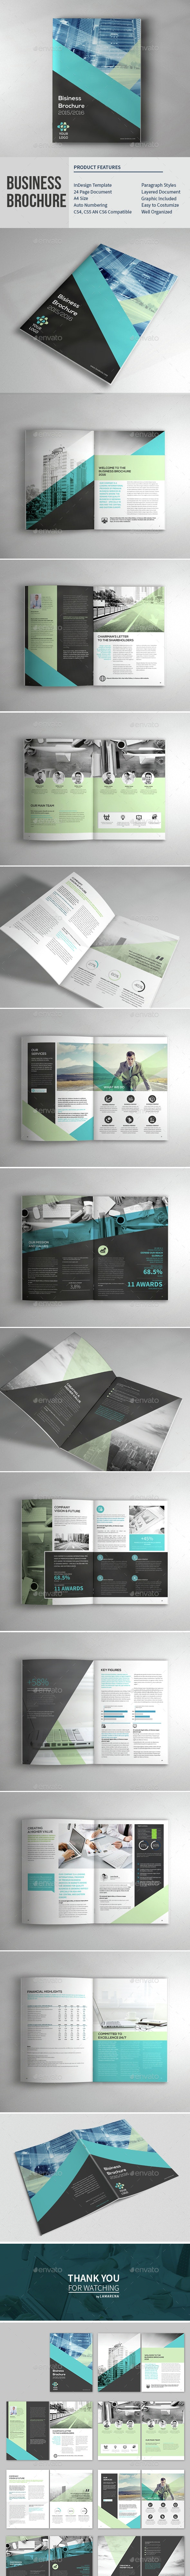 Business Corporate Brochure - Brochures Print Templates